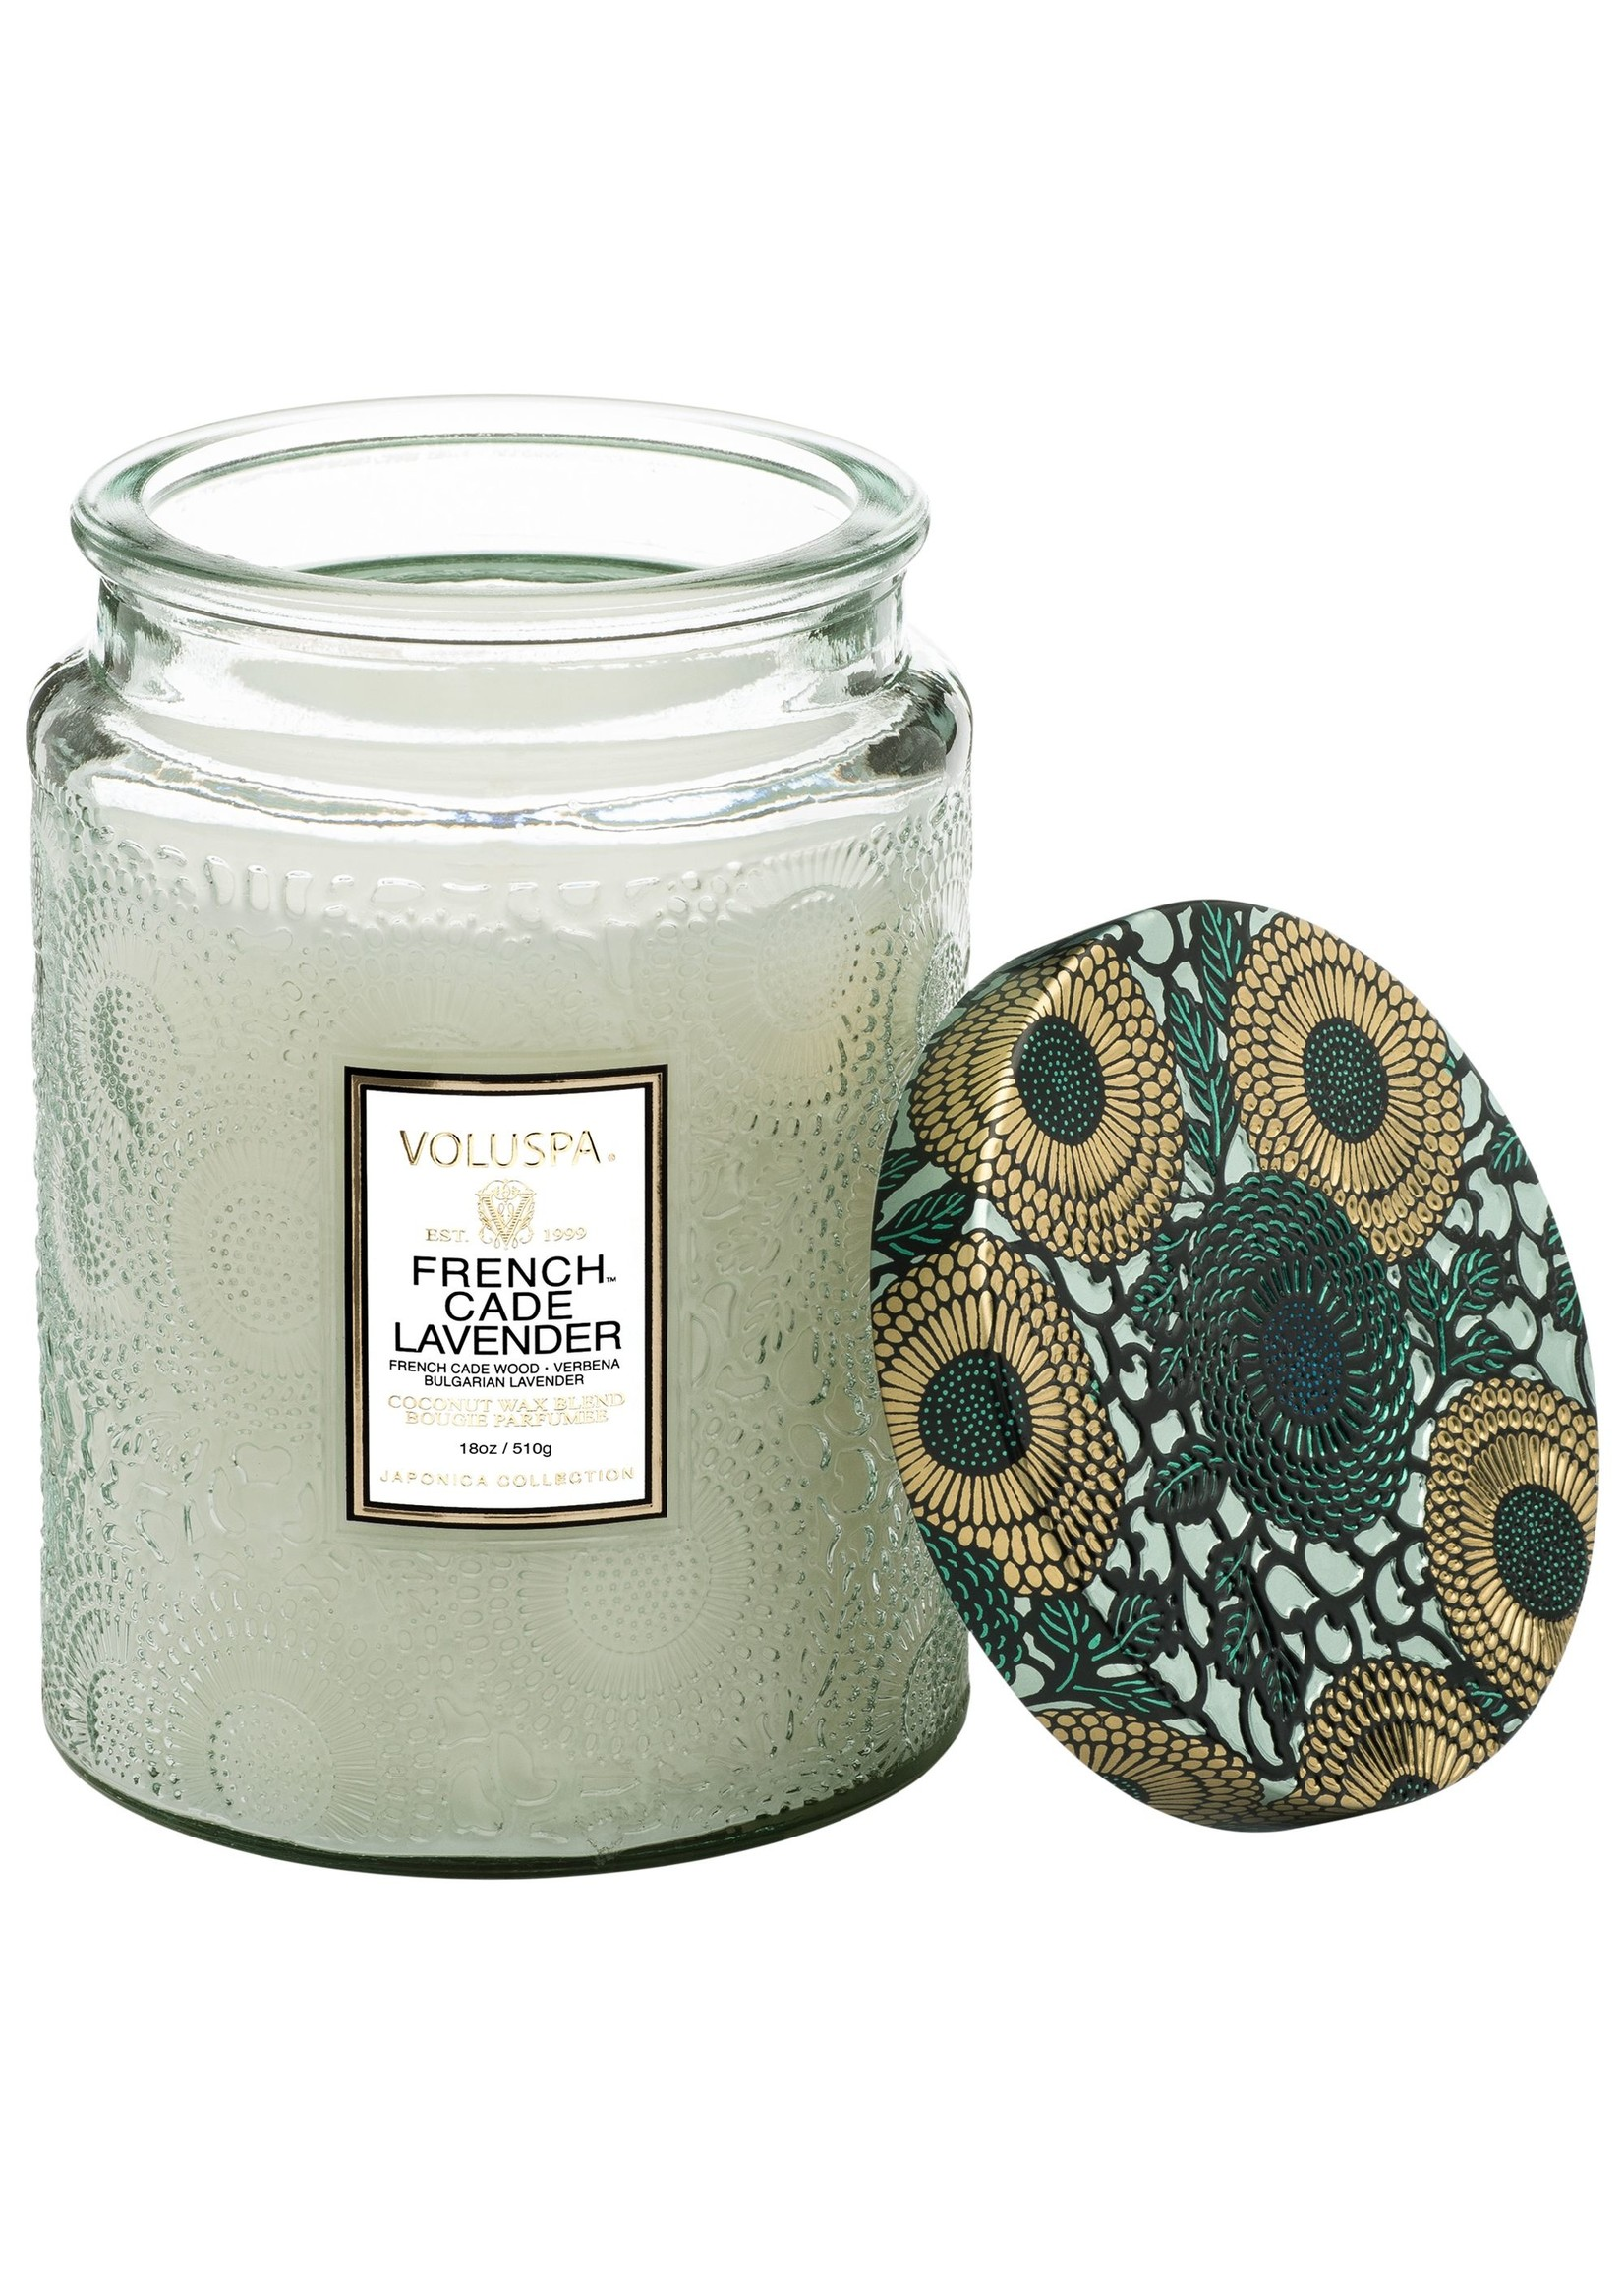 Voluspa French Cade & Lavender Large Jar Candle